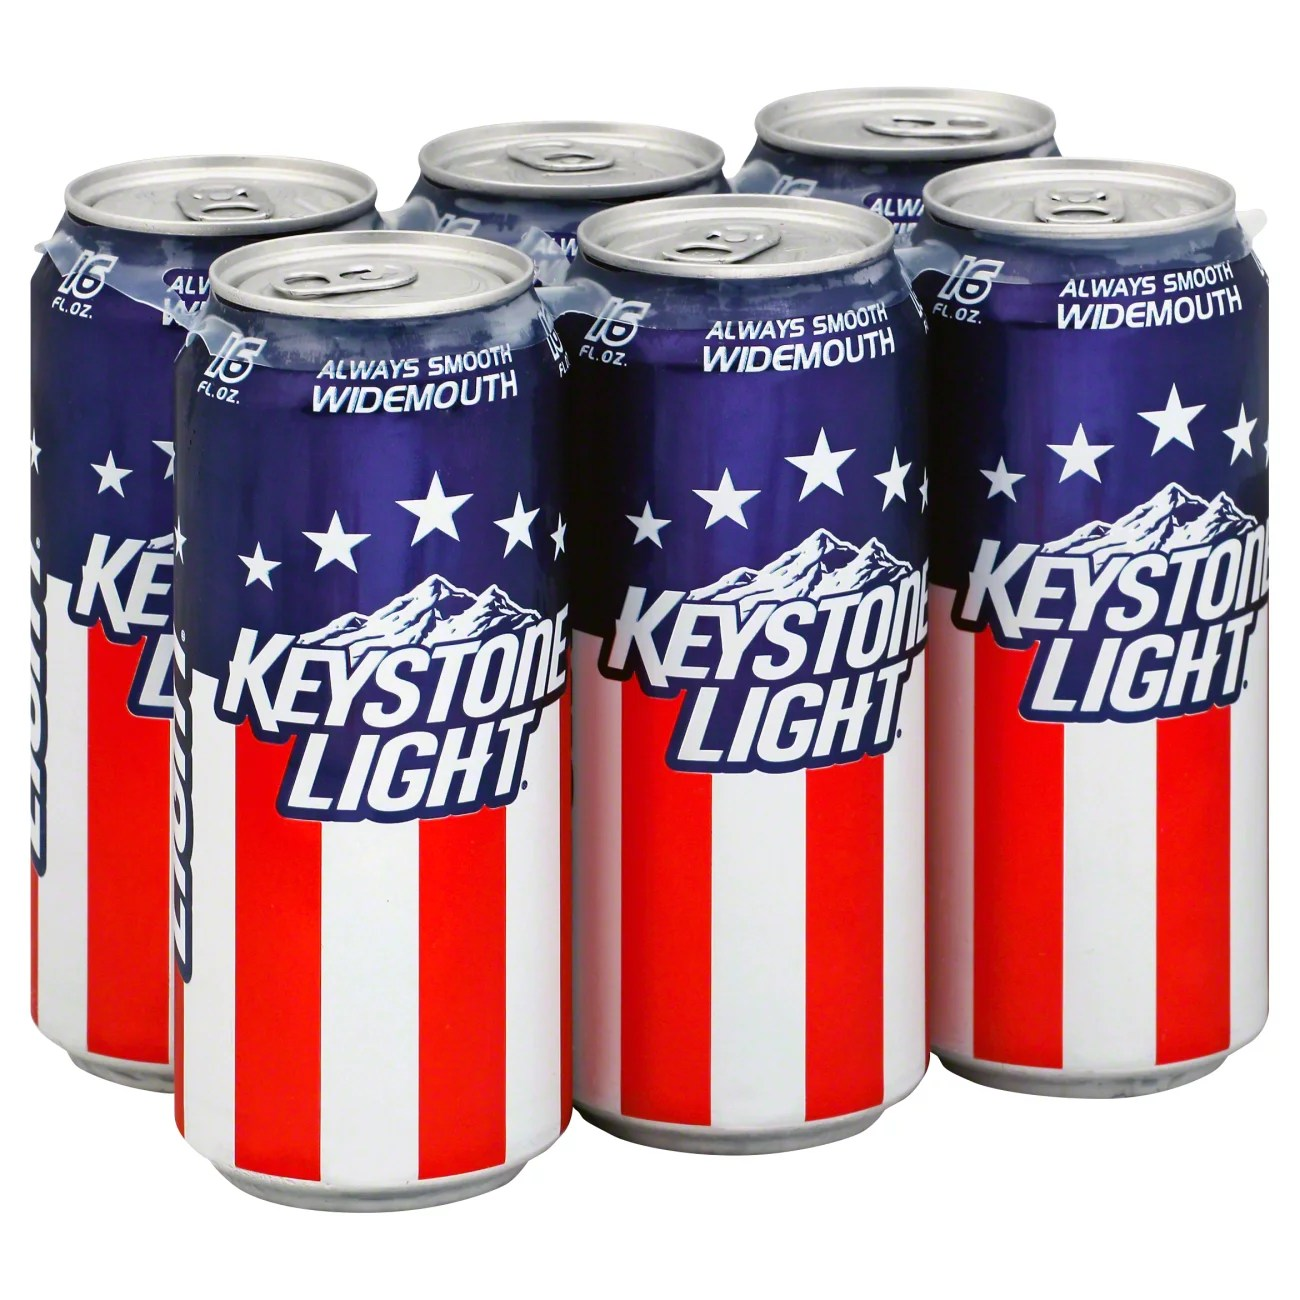 Keystone Light Calories